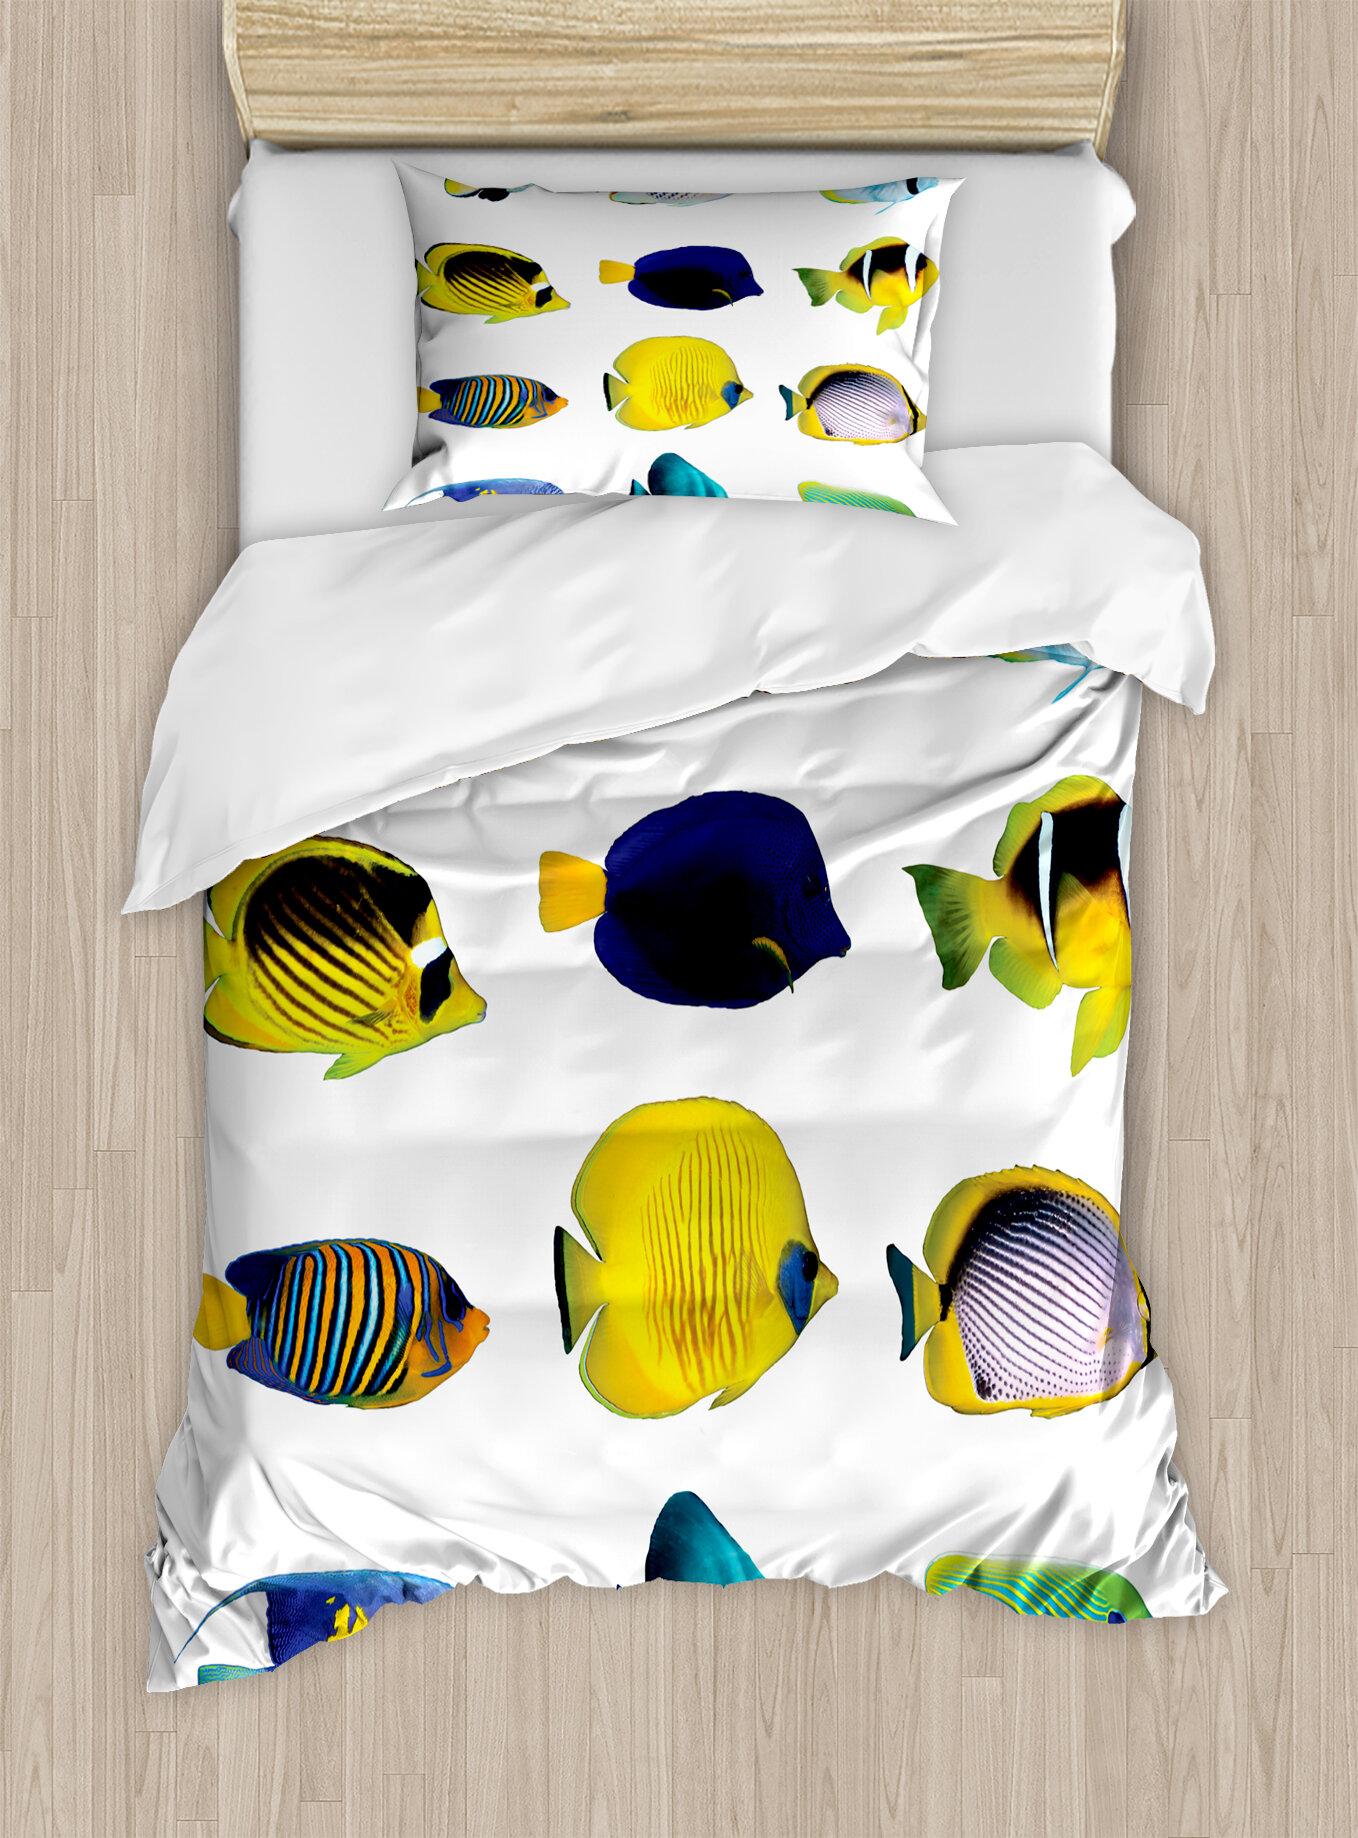 East Urban Home Ocean Animal Tropical Fish Figures With Zebrasoma Anemonefish Dive Nemo Aqua Home Decor Duvet Cover Set Wayfair